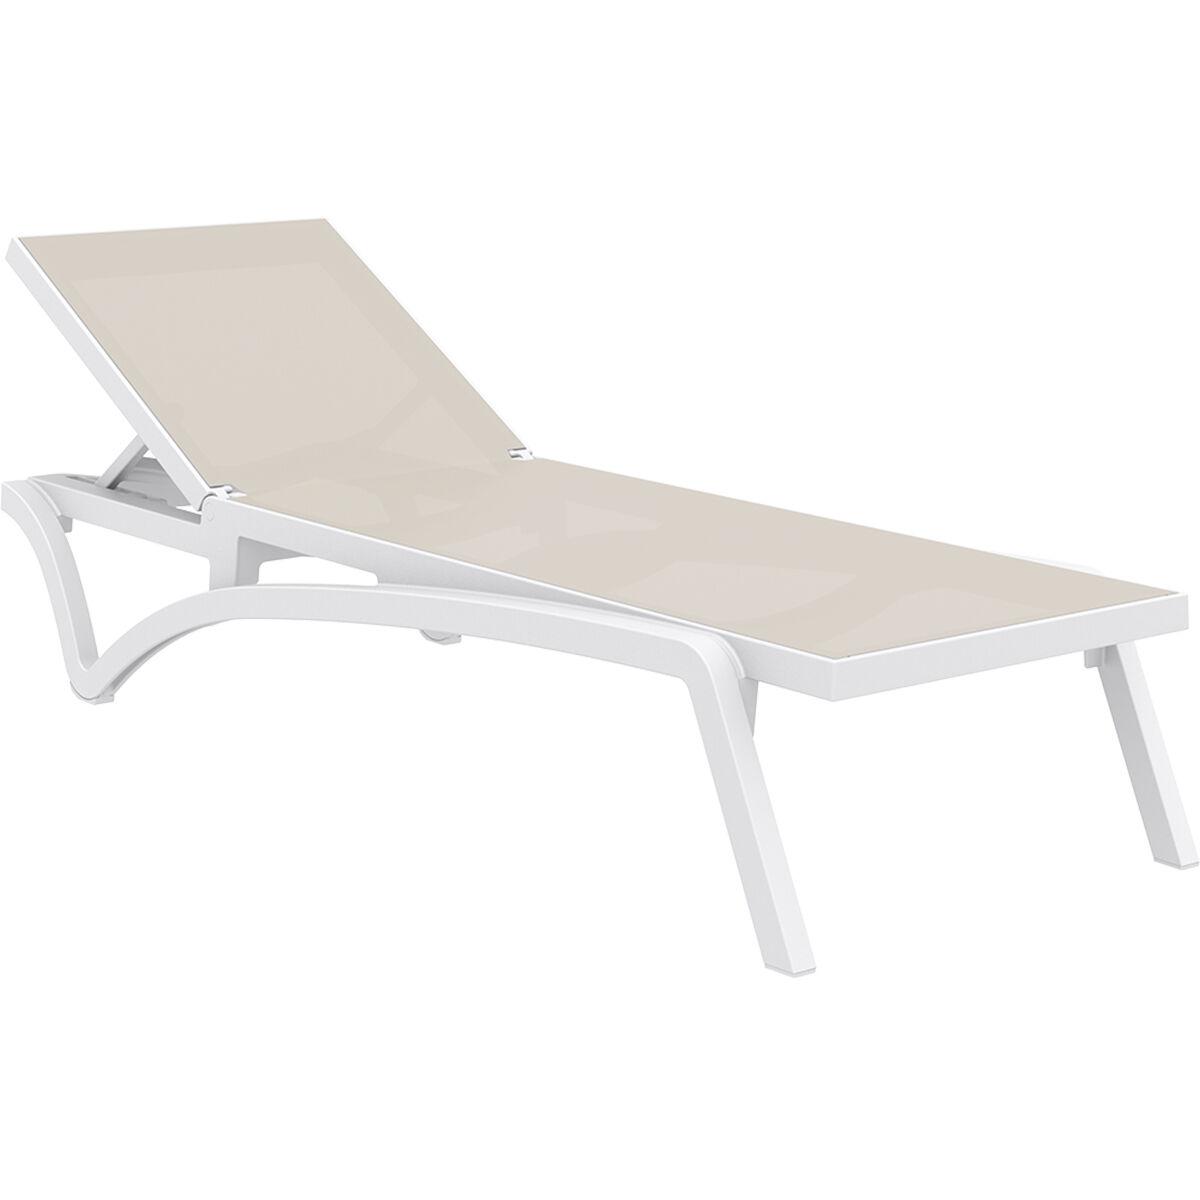 Miliboo Chaise longue empilable blanc et taupe CORAIL